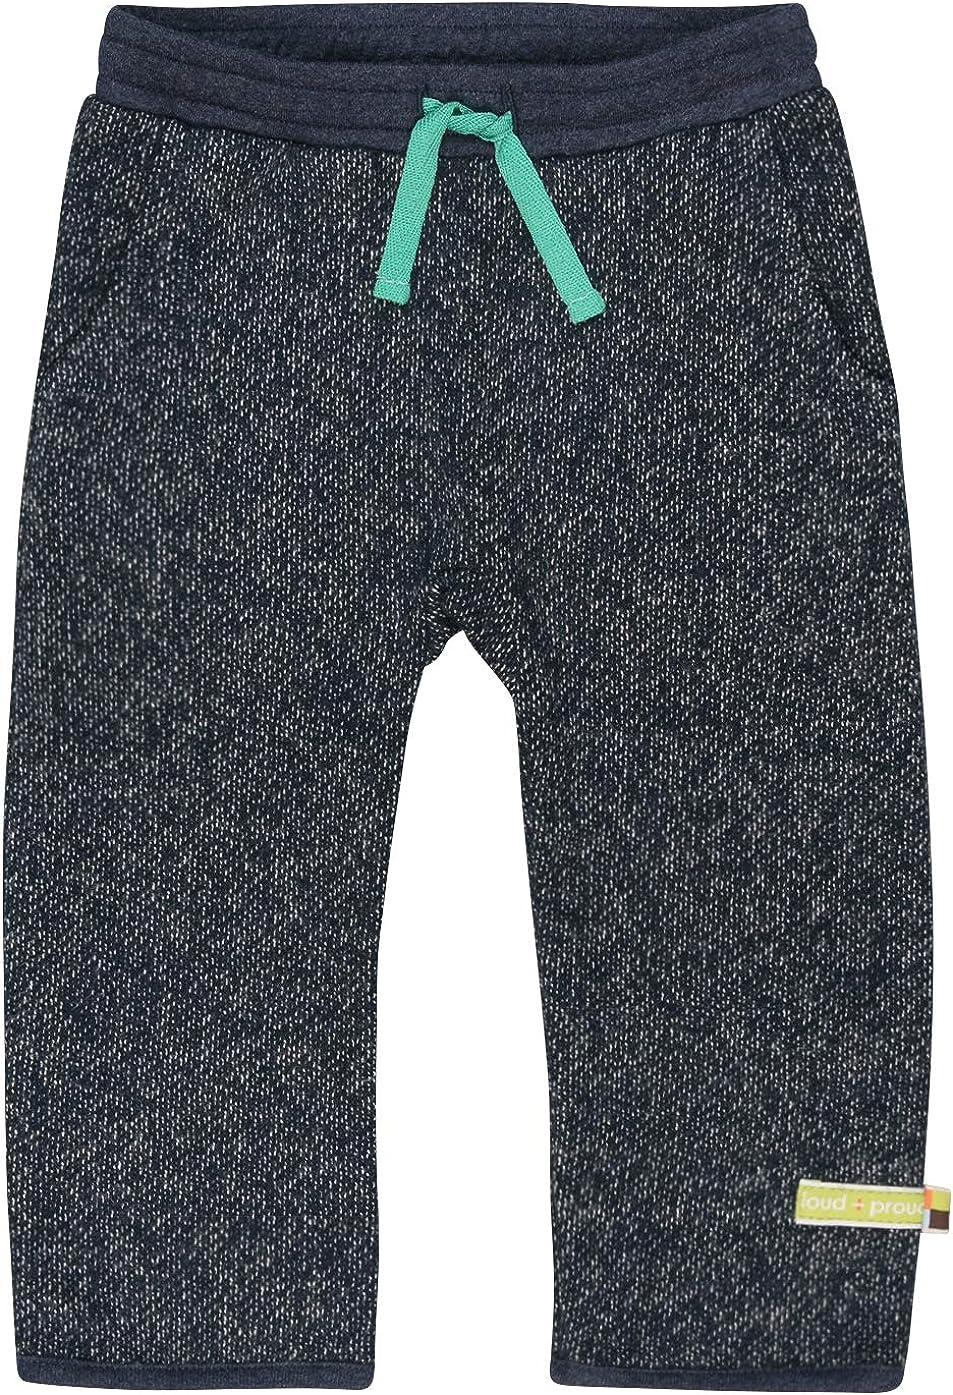 proud Baby Wendehose Aus Bio Baumwolle loud GOTS Zertifiziert Trouser